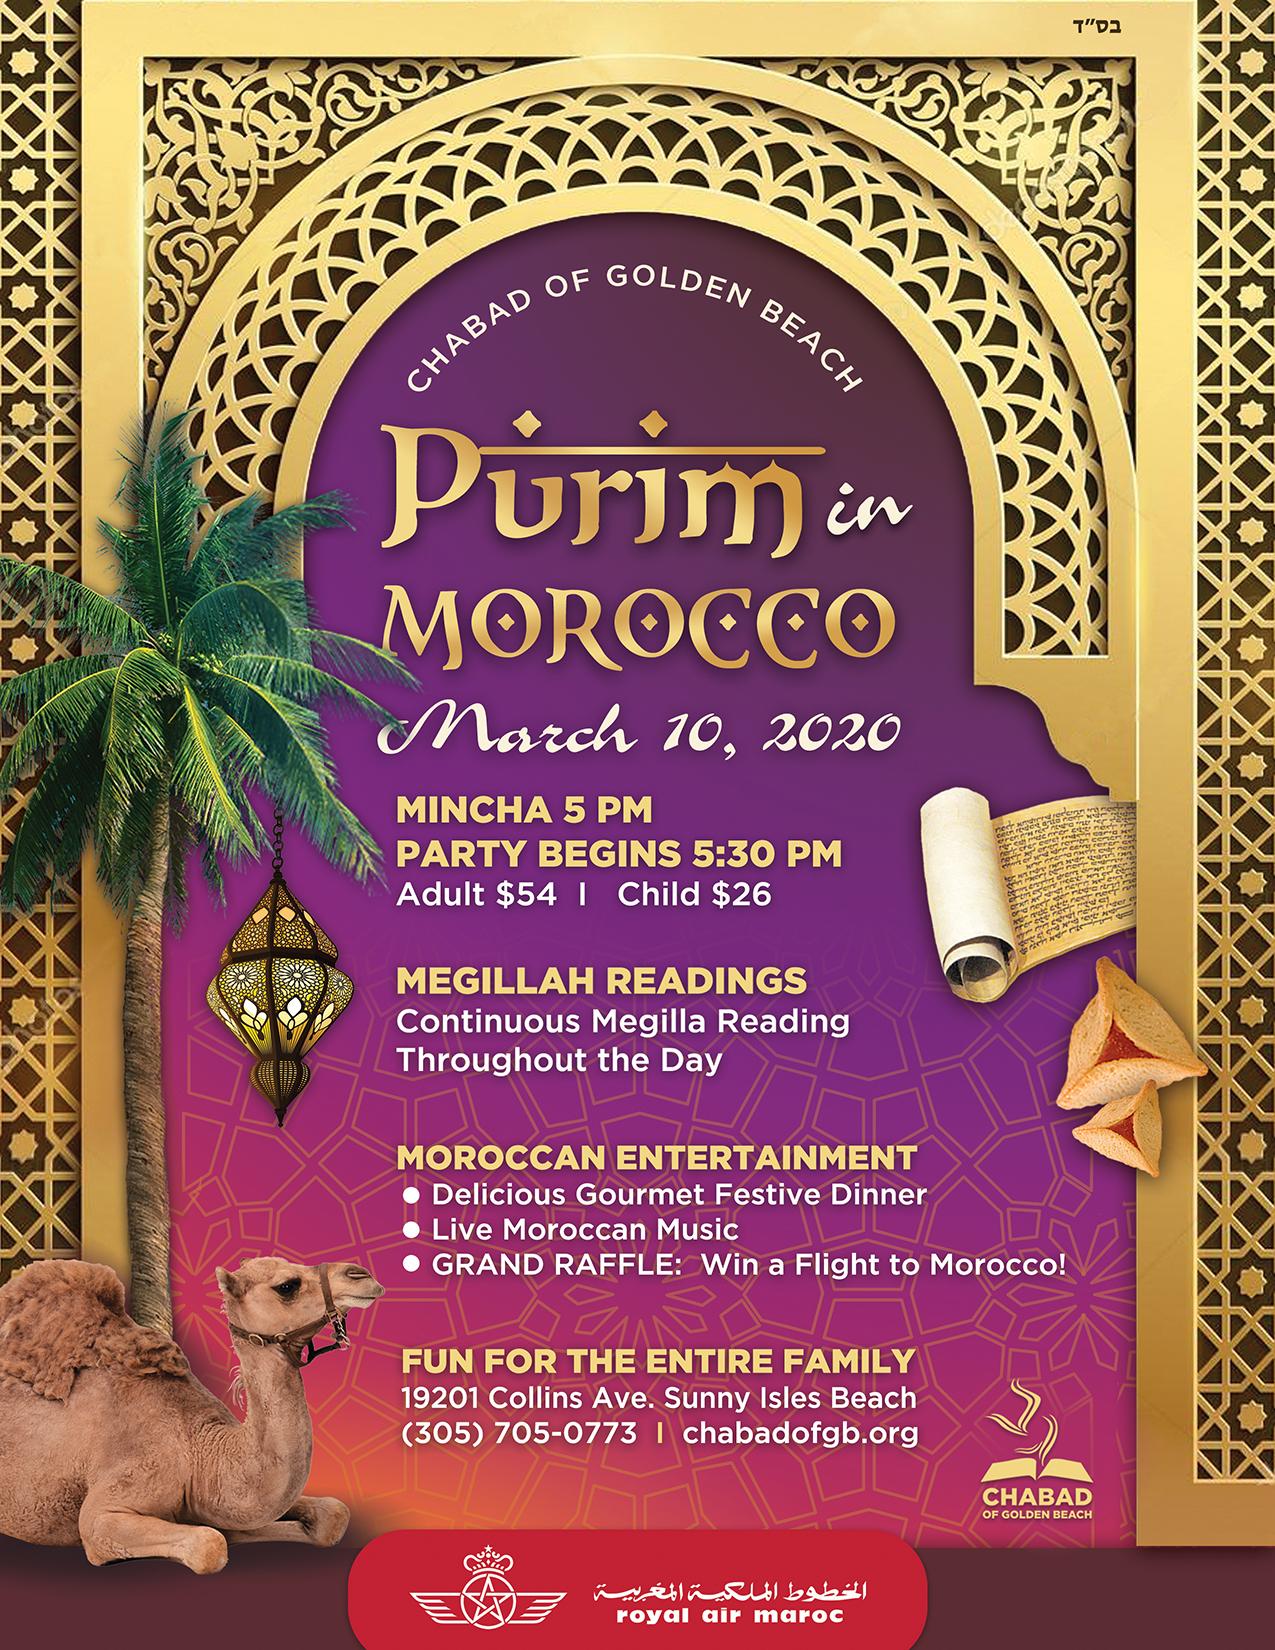 Purim in Morocco Flyer (webSM).jpg